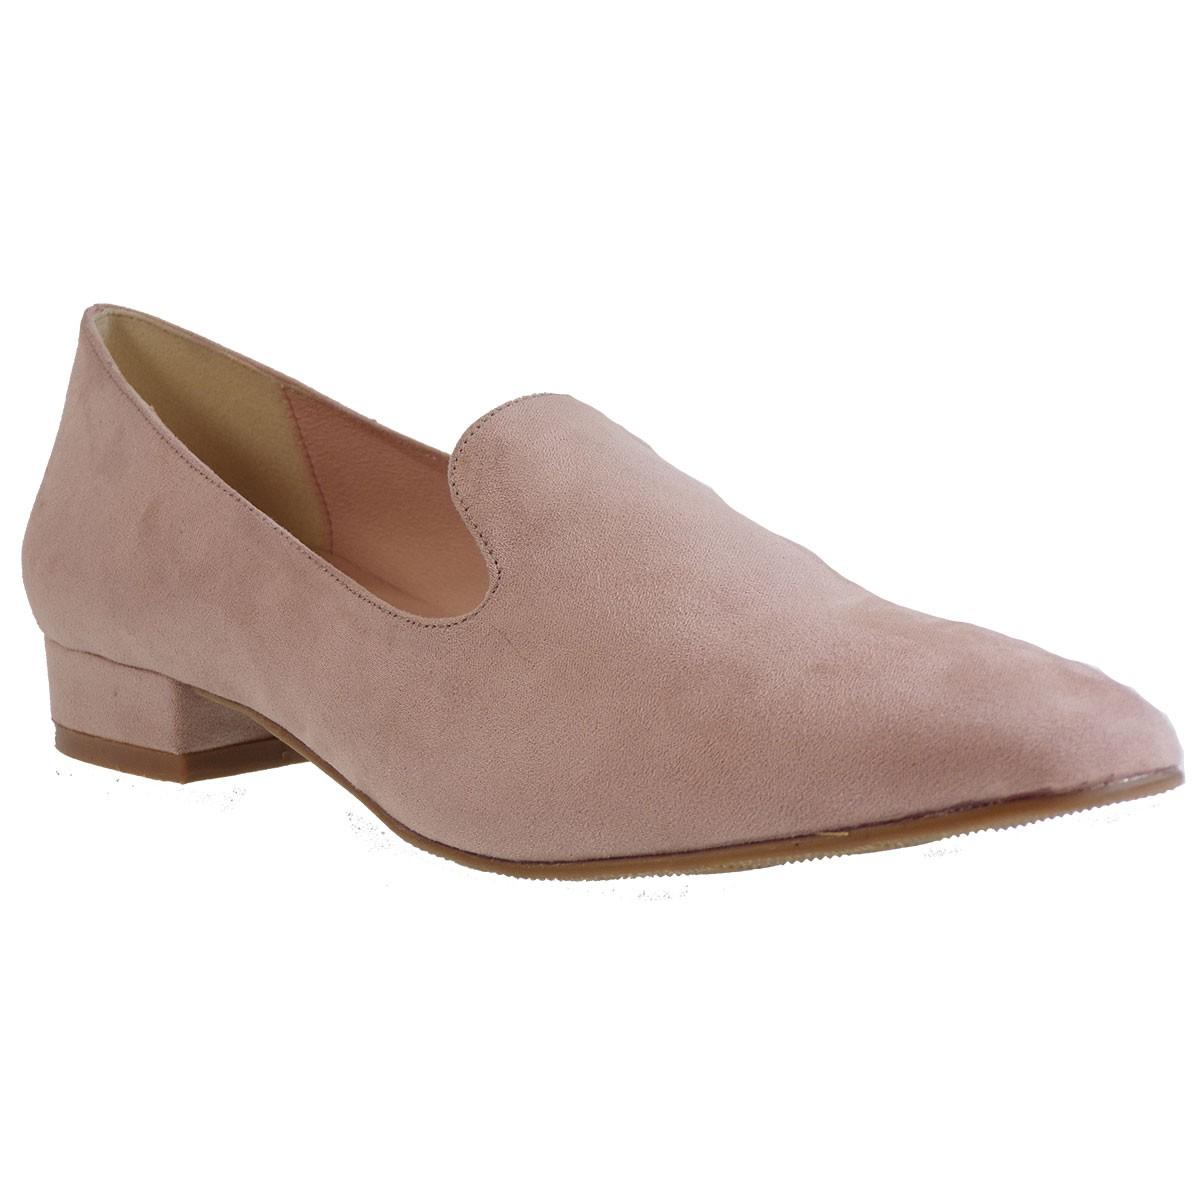 Moods Shoes Γυναικεία Παπούτσια 1500 Nude